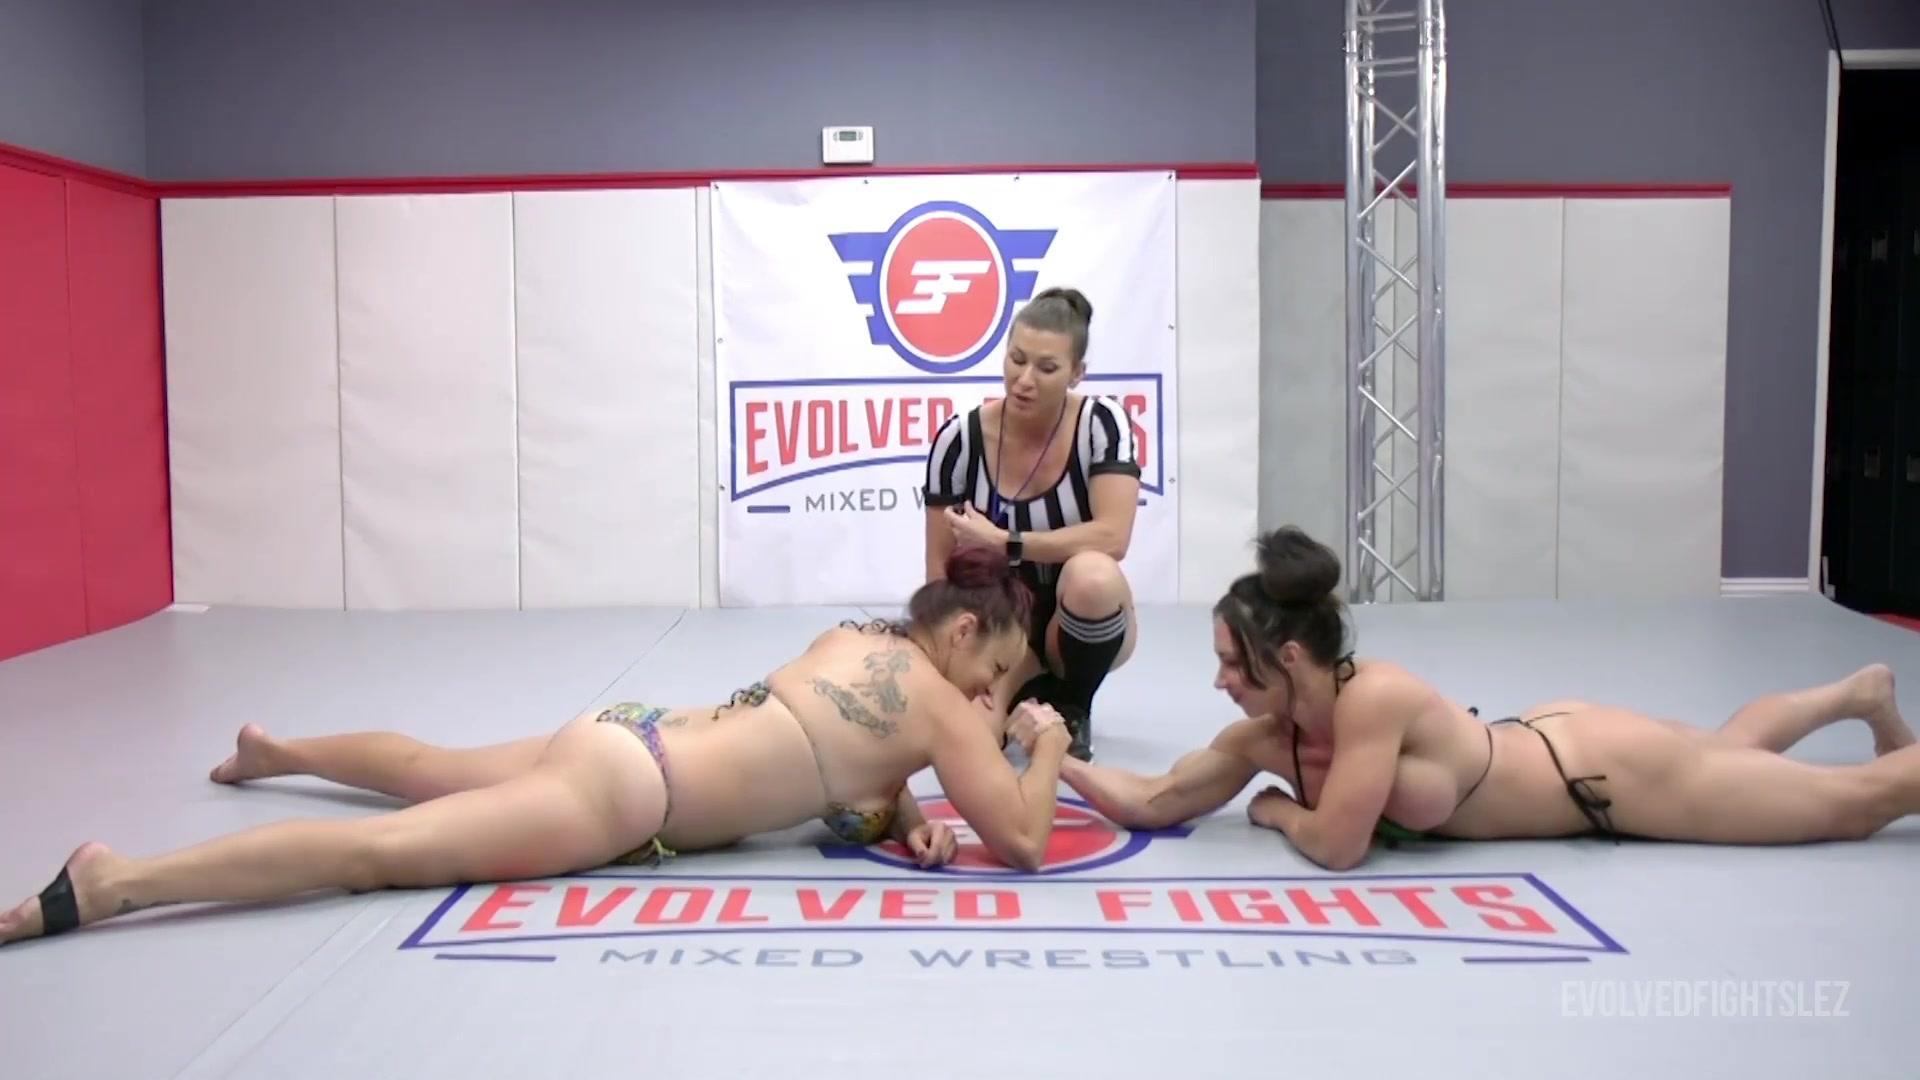 EvolvedFightsLez 20 09 29 Bella Rossi Vs Brandi Mae Arm Wrestling XXX 1080p MP4-FETiSH